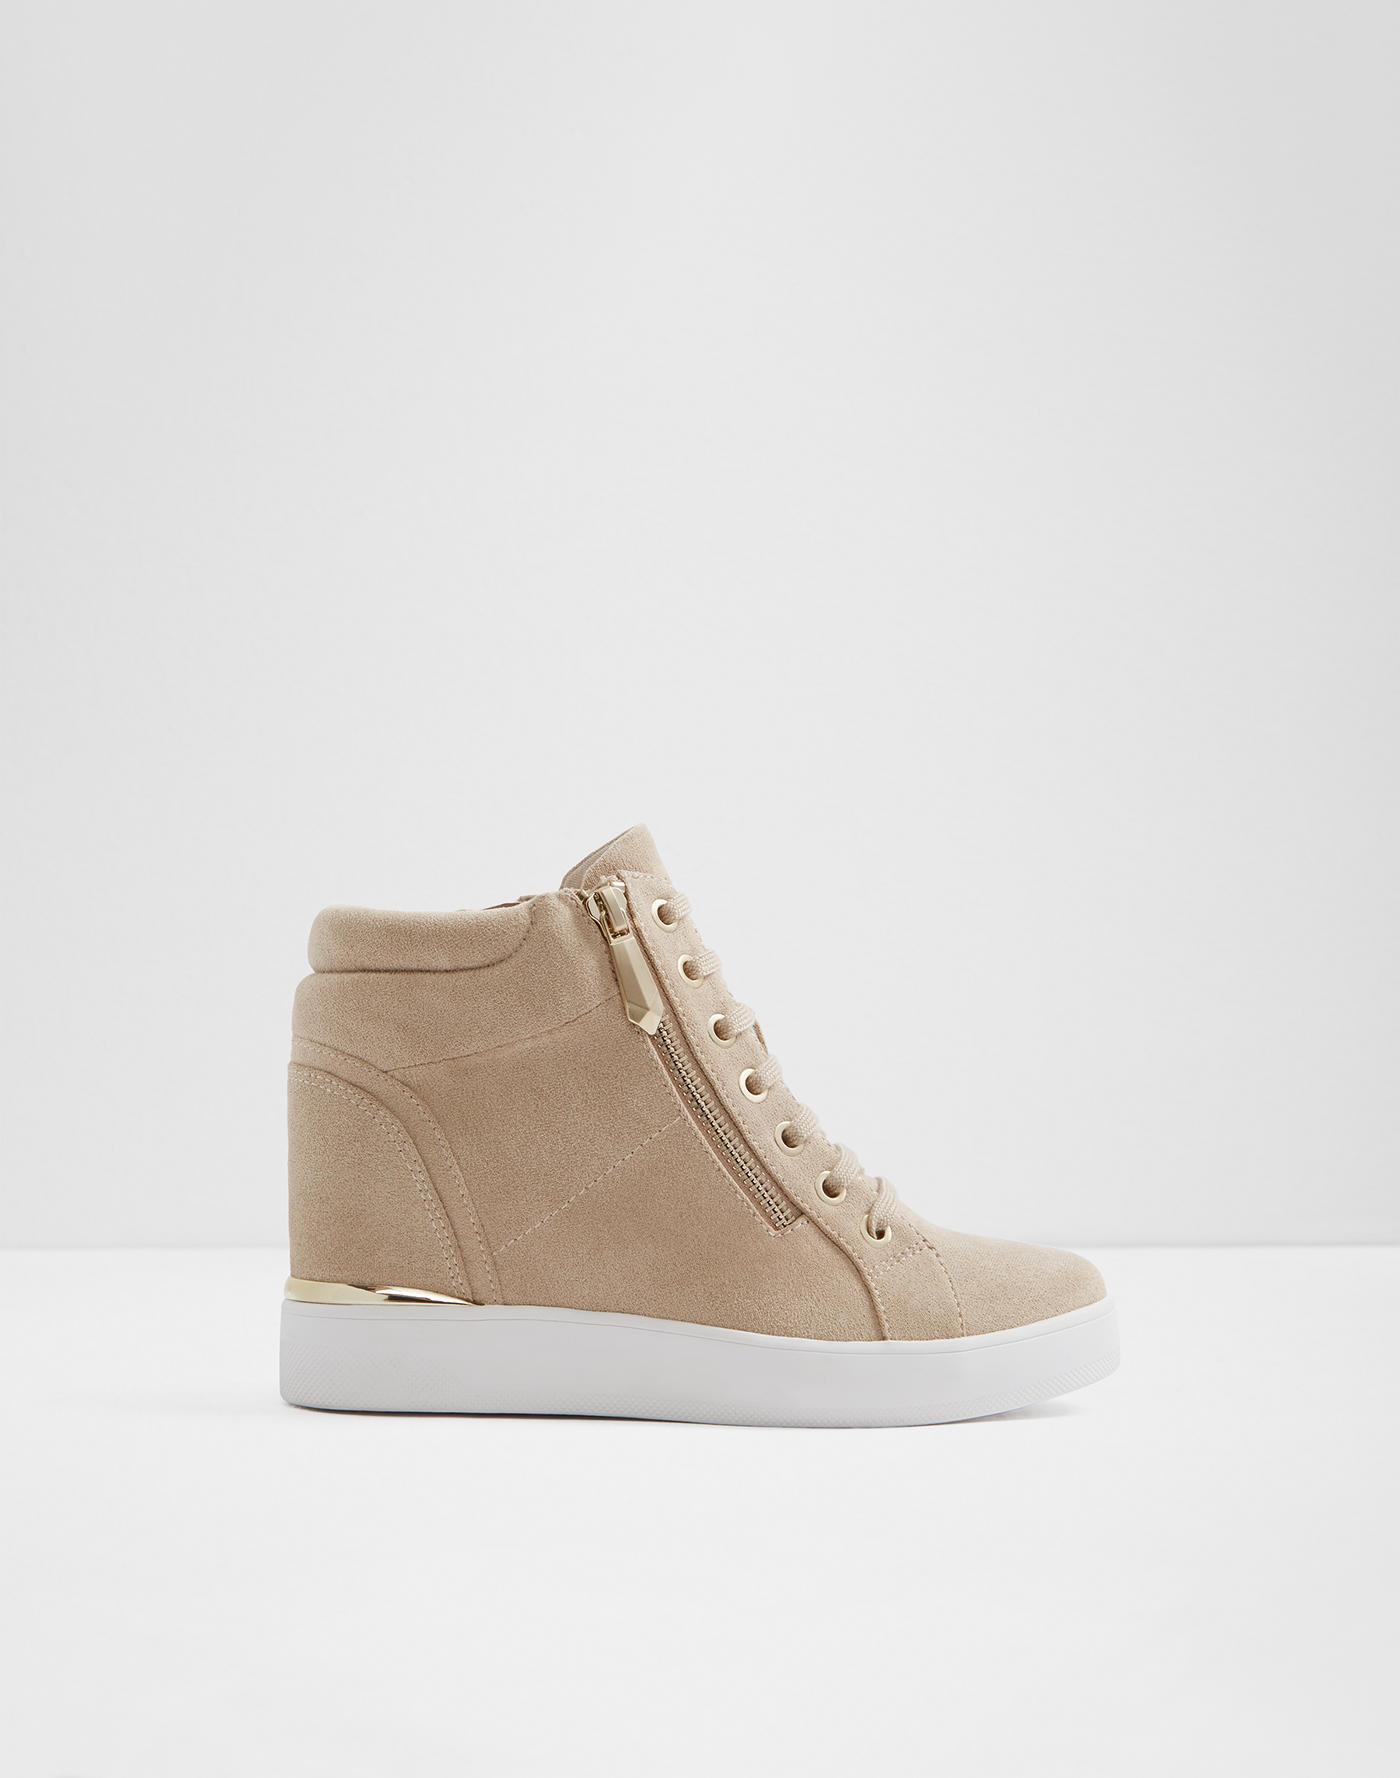 494a712c2daa Sneakers